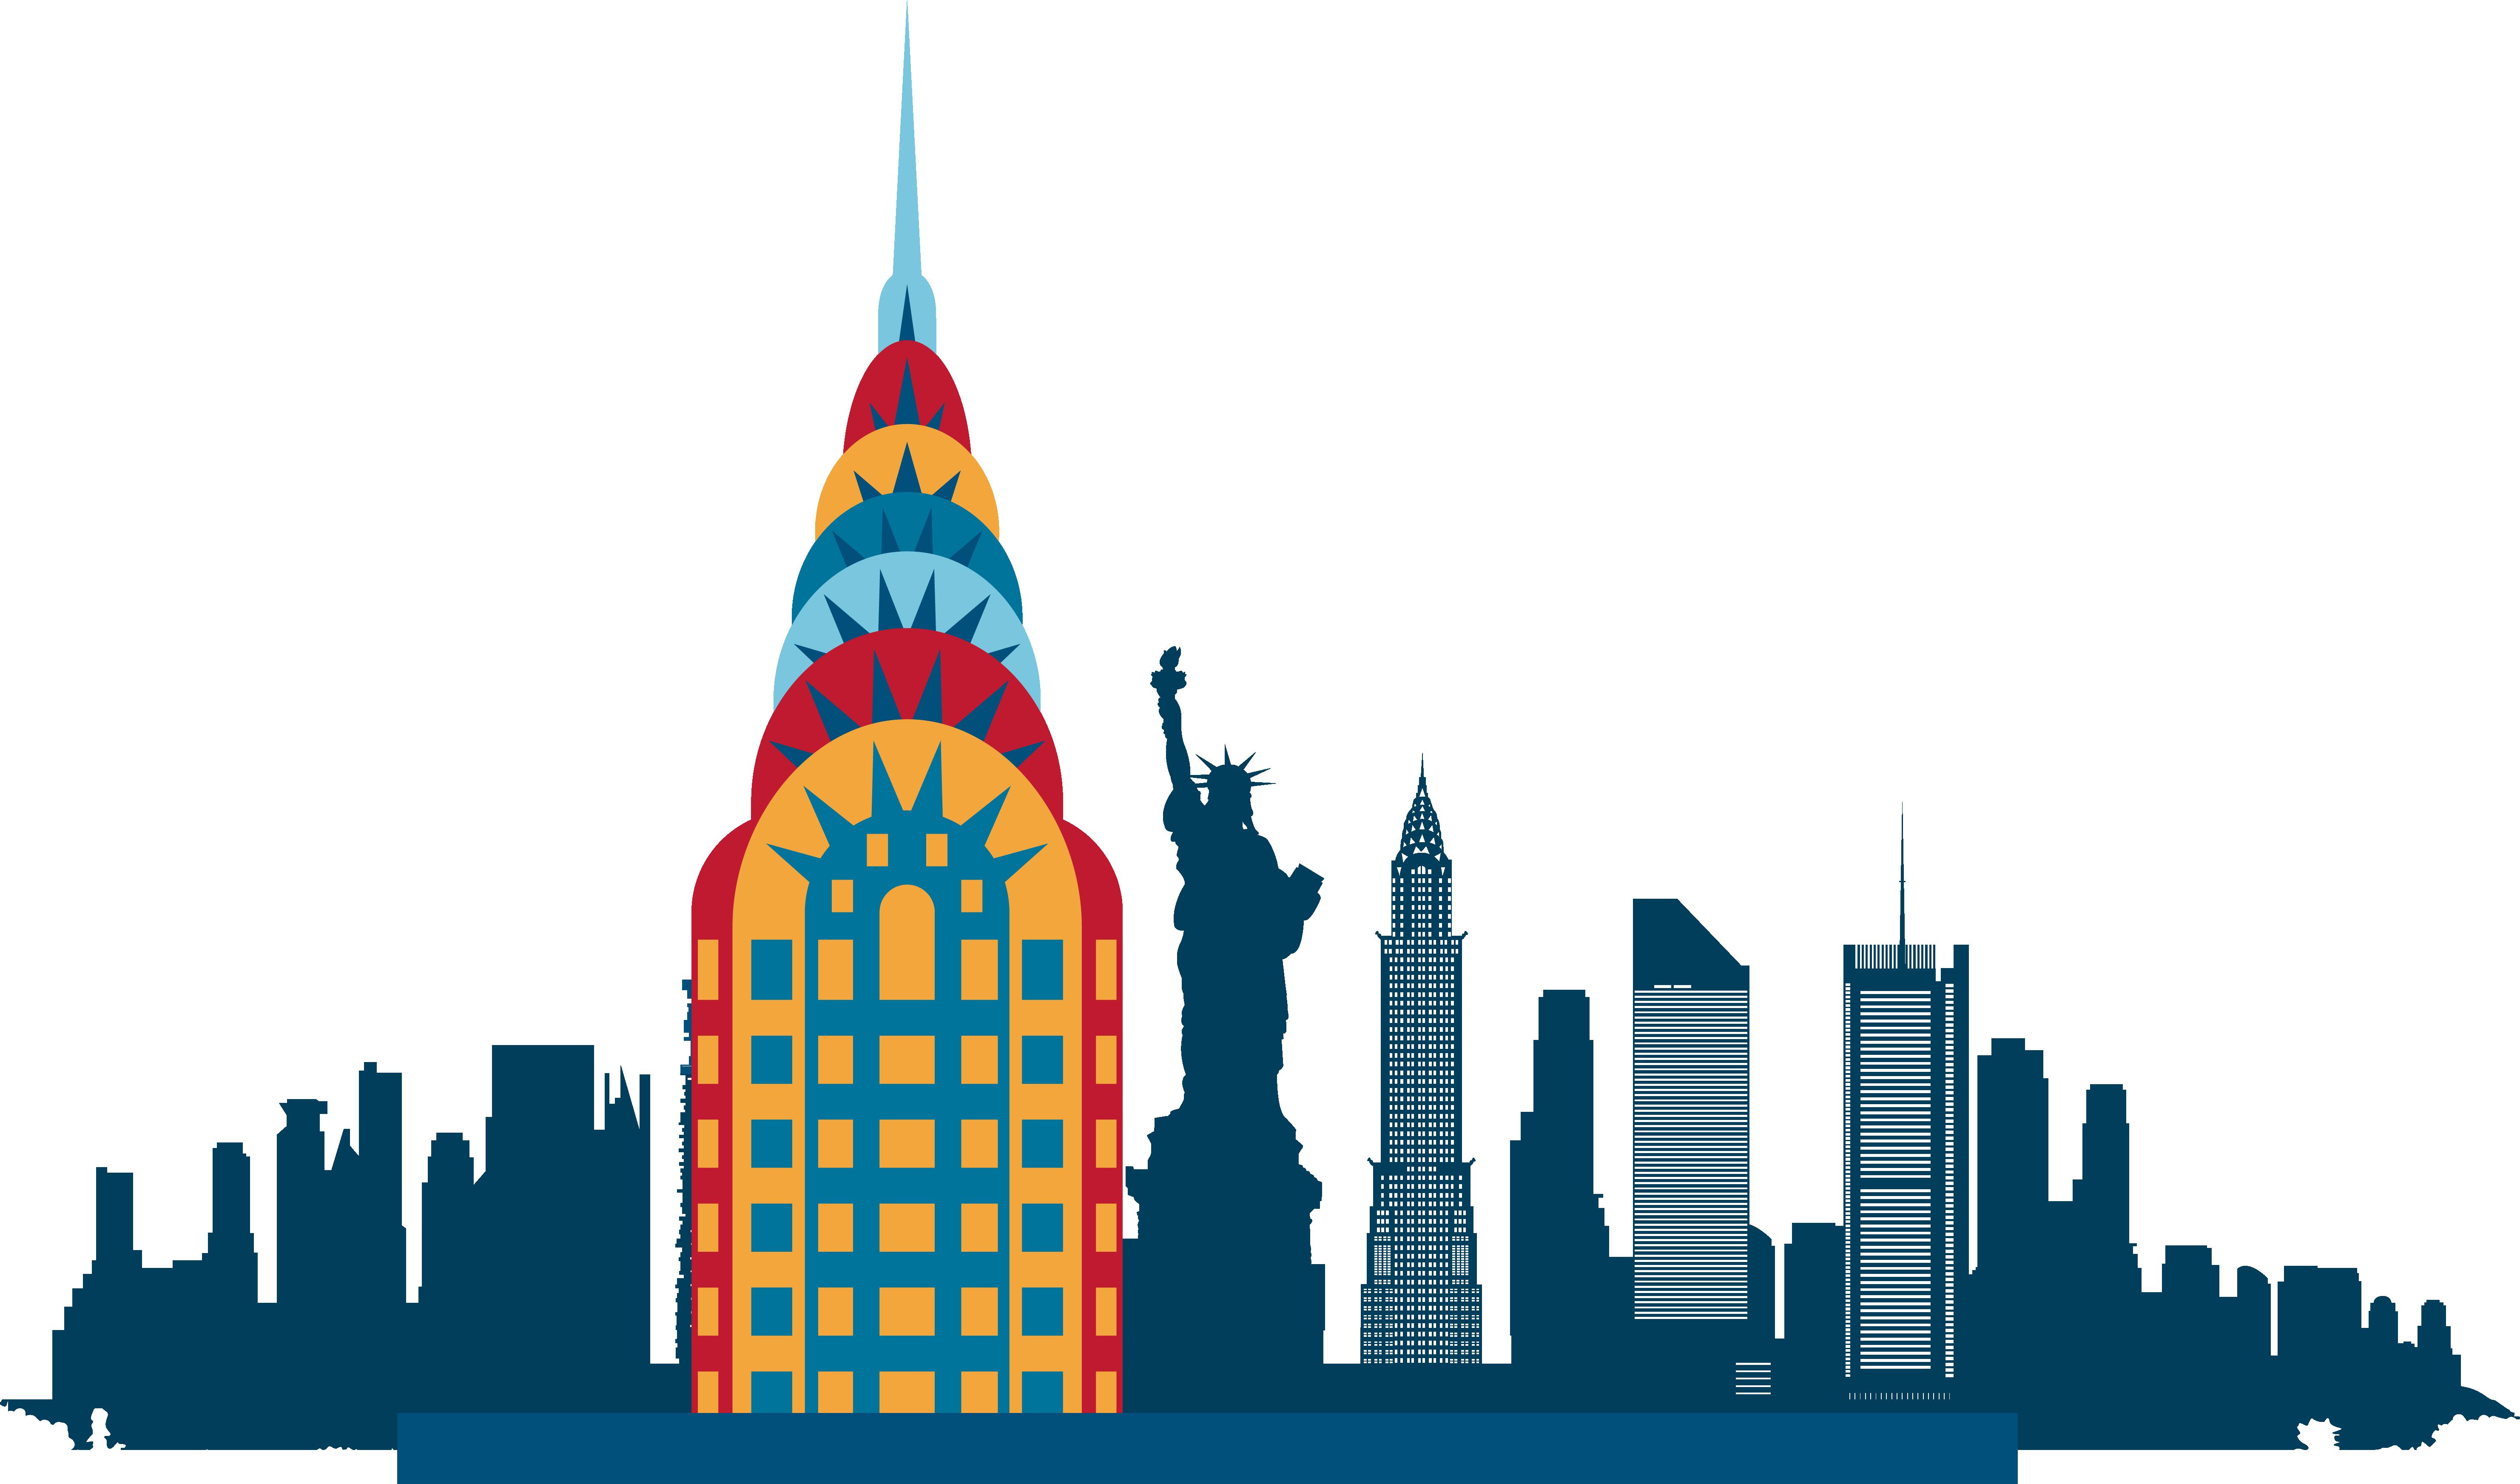 New York City Skyline Silhouette Illustration.